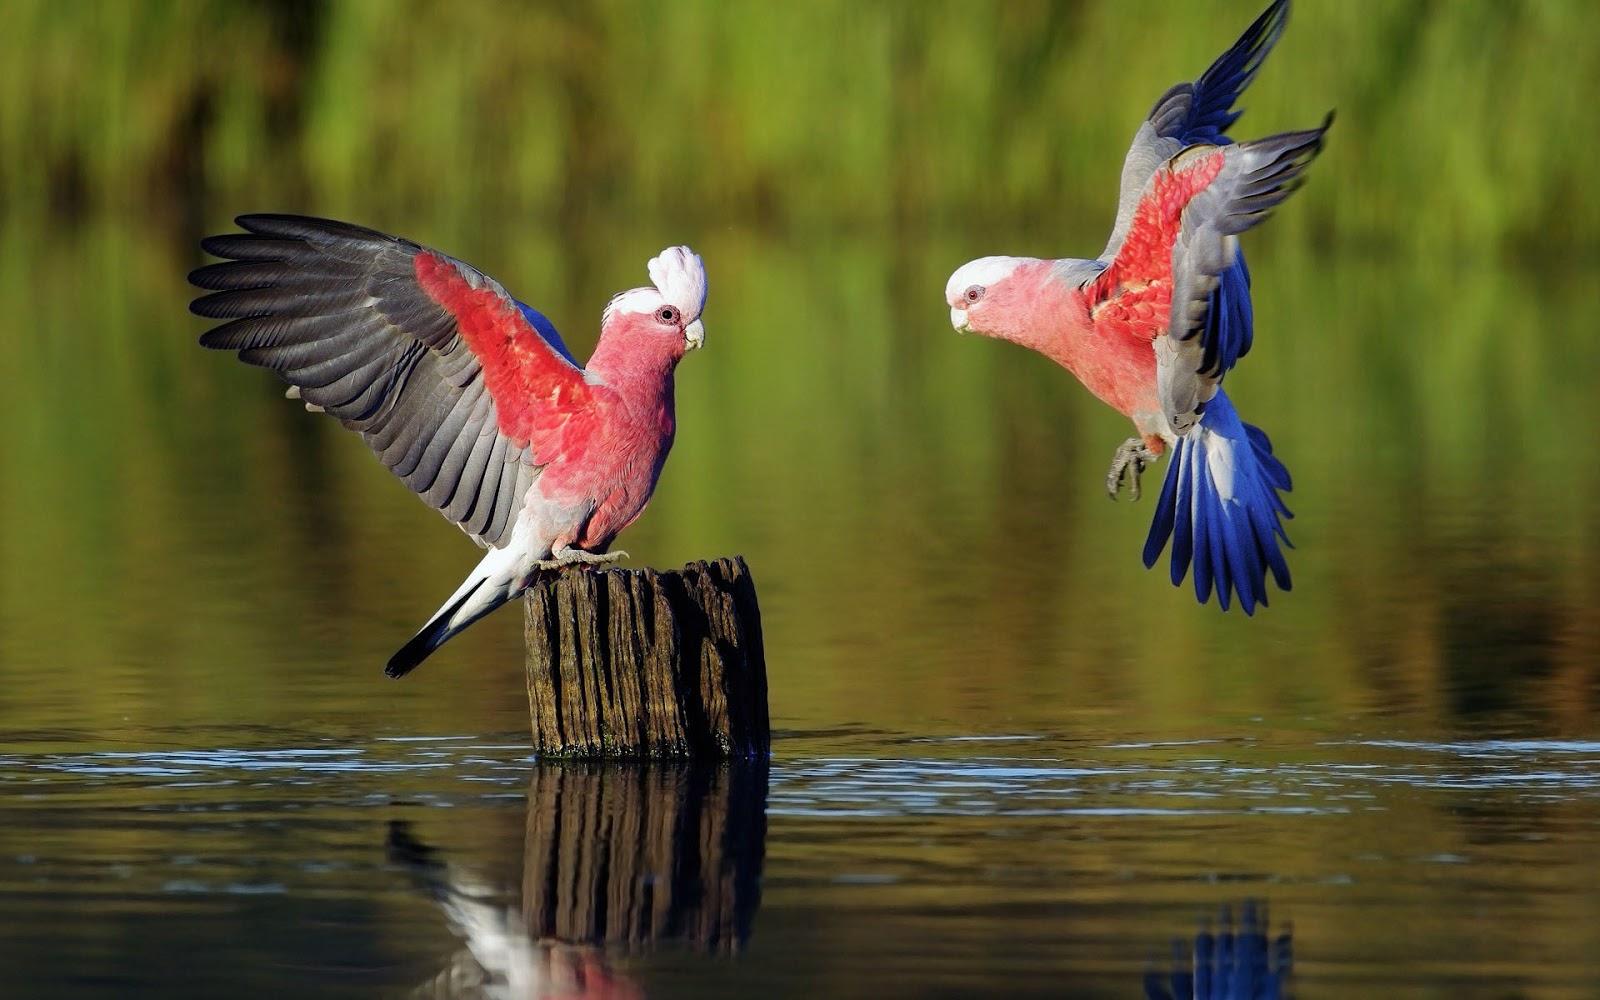 Beautiful parrots wallpapers wallpapersafari - Animal and bird hd wallpaper ...